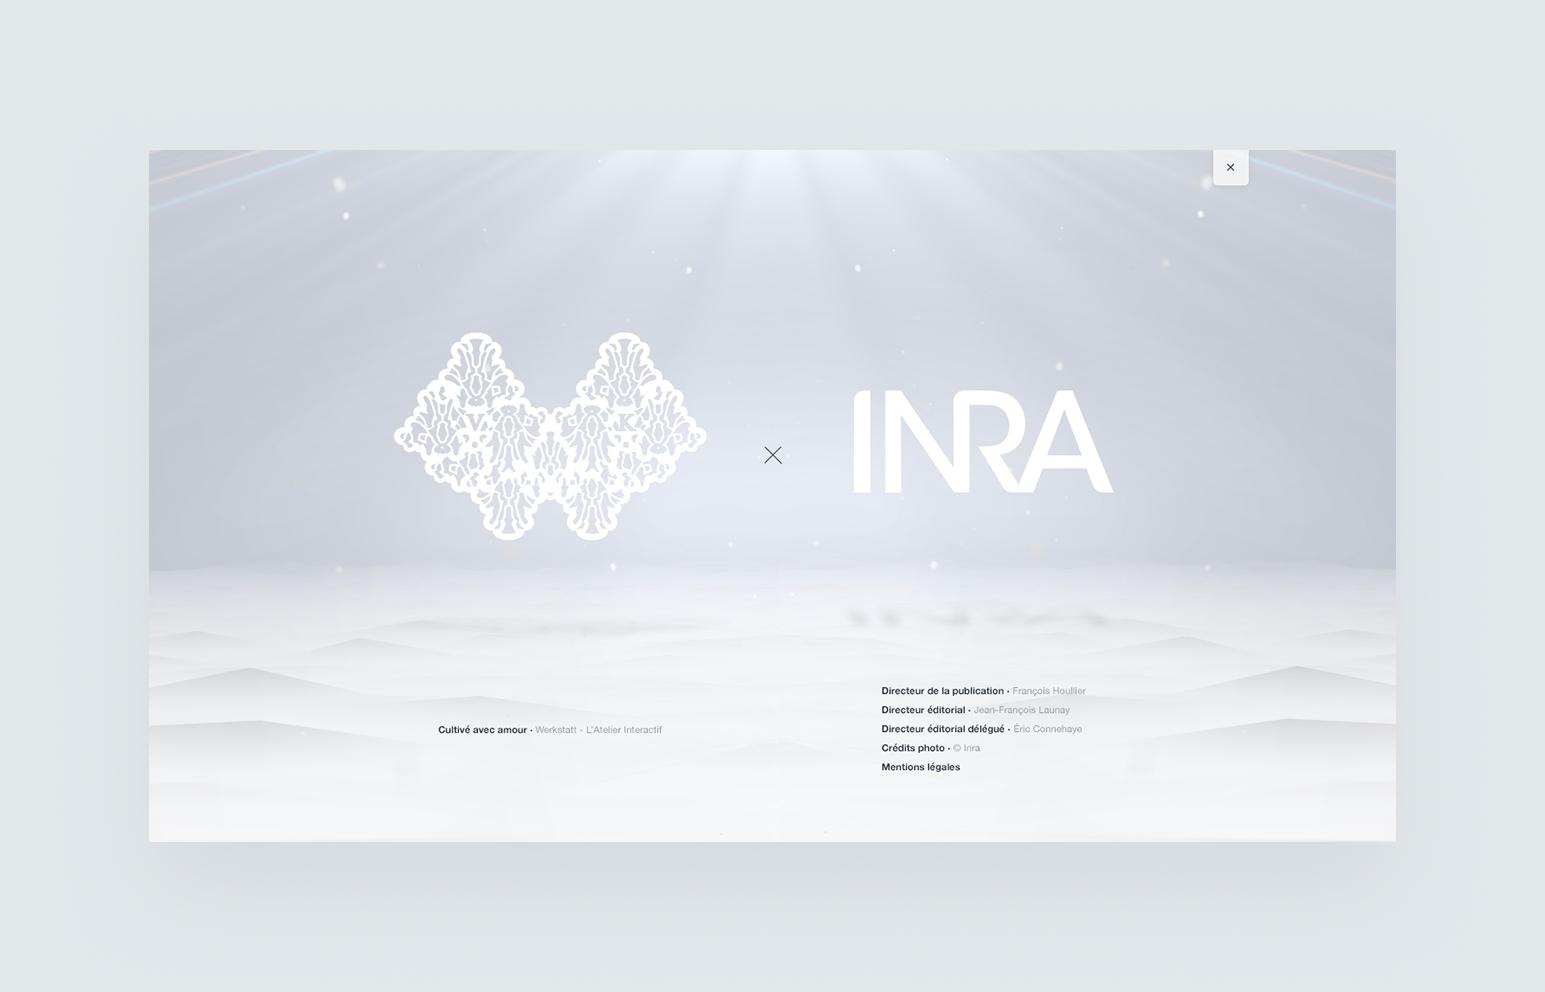 inra-screen-03-V2